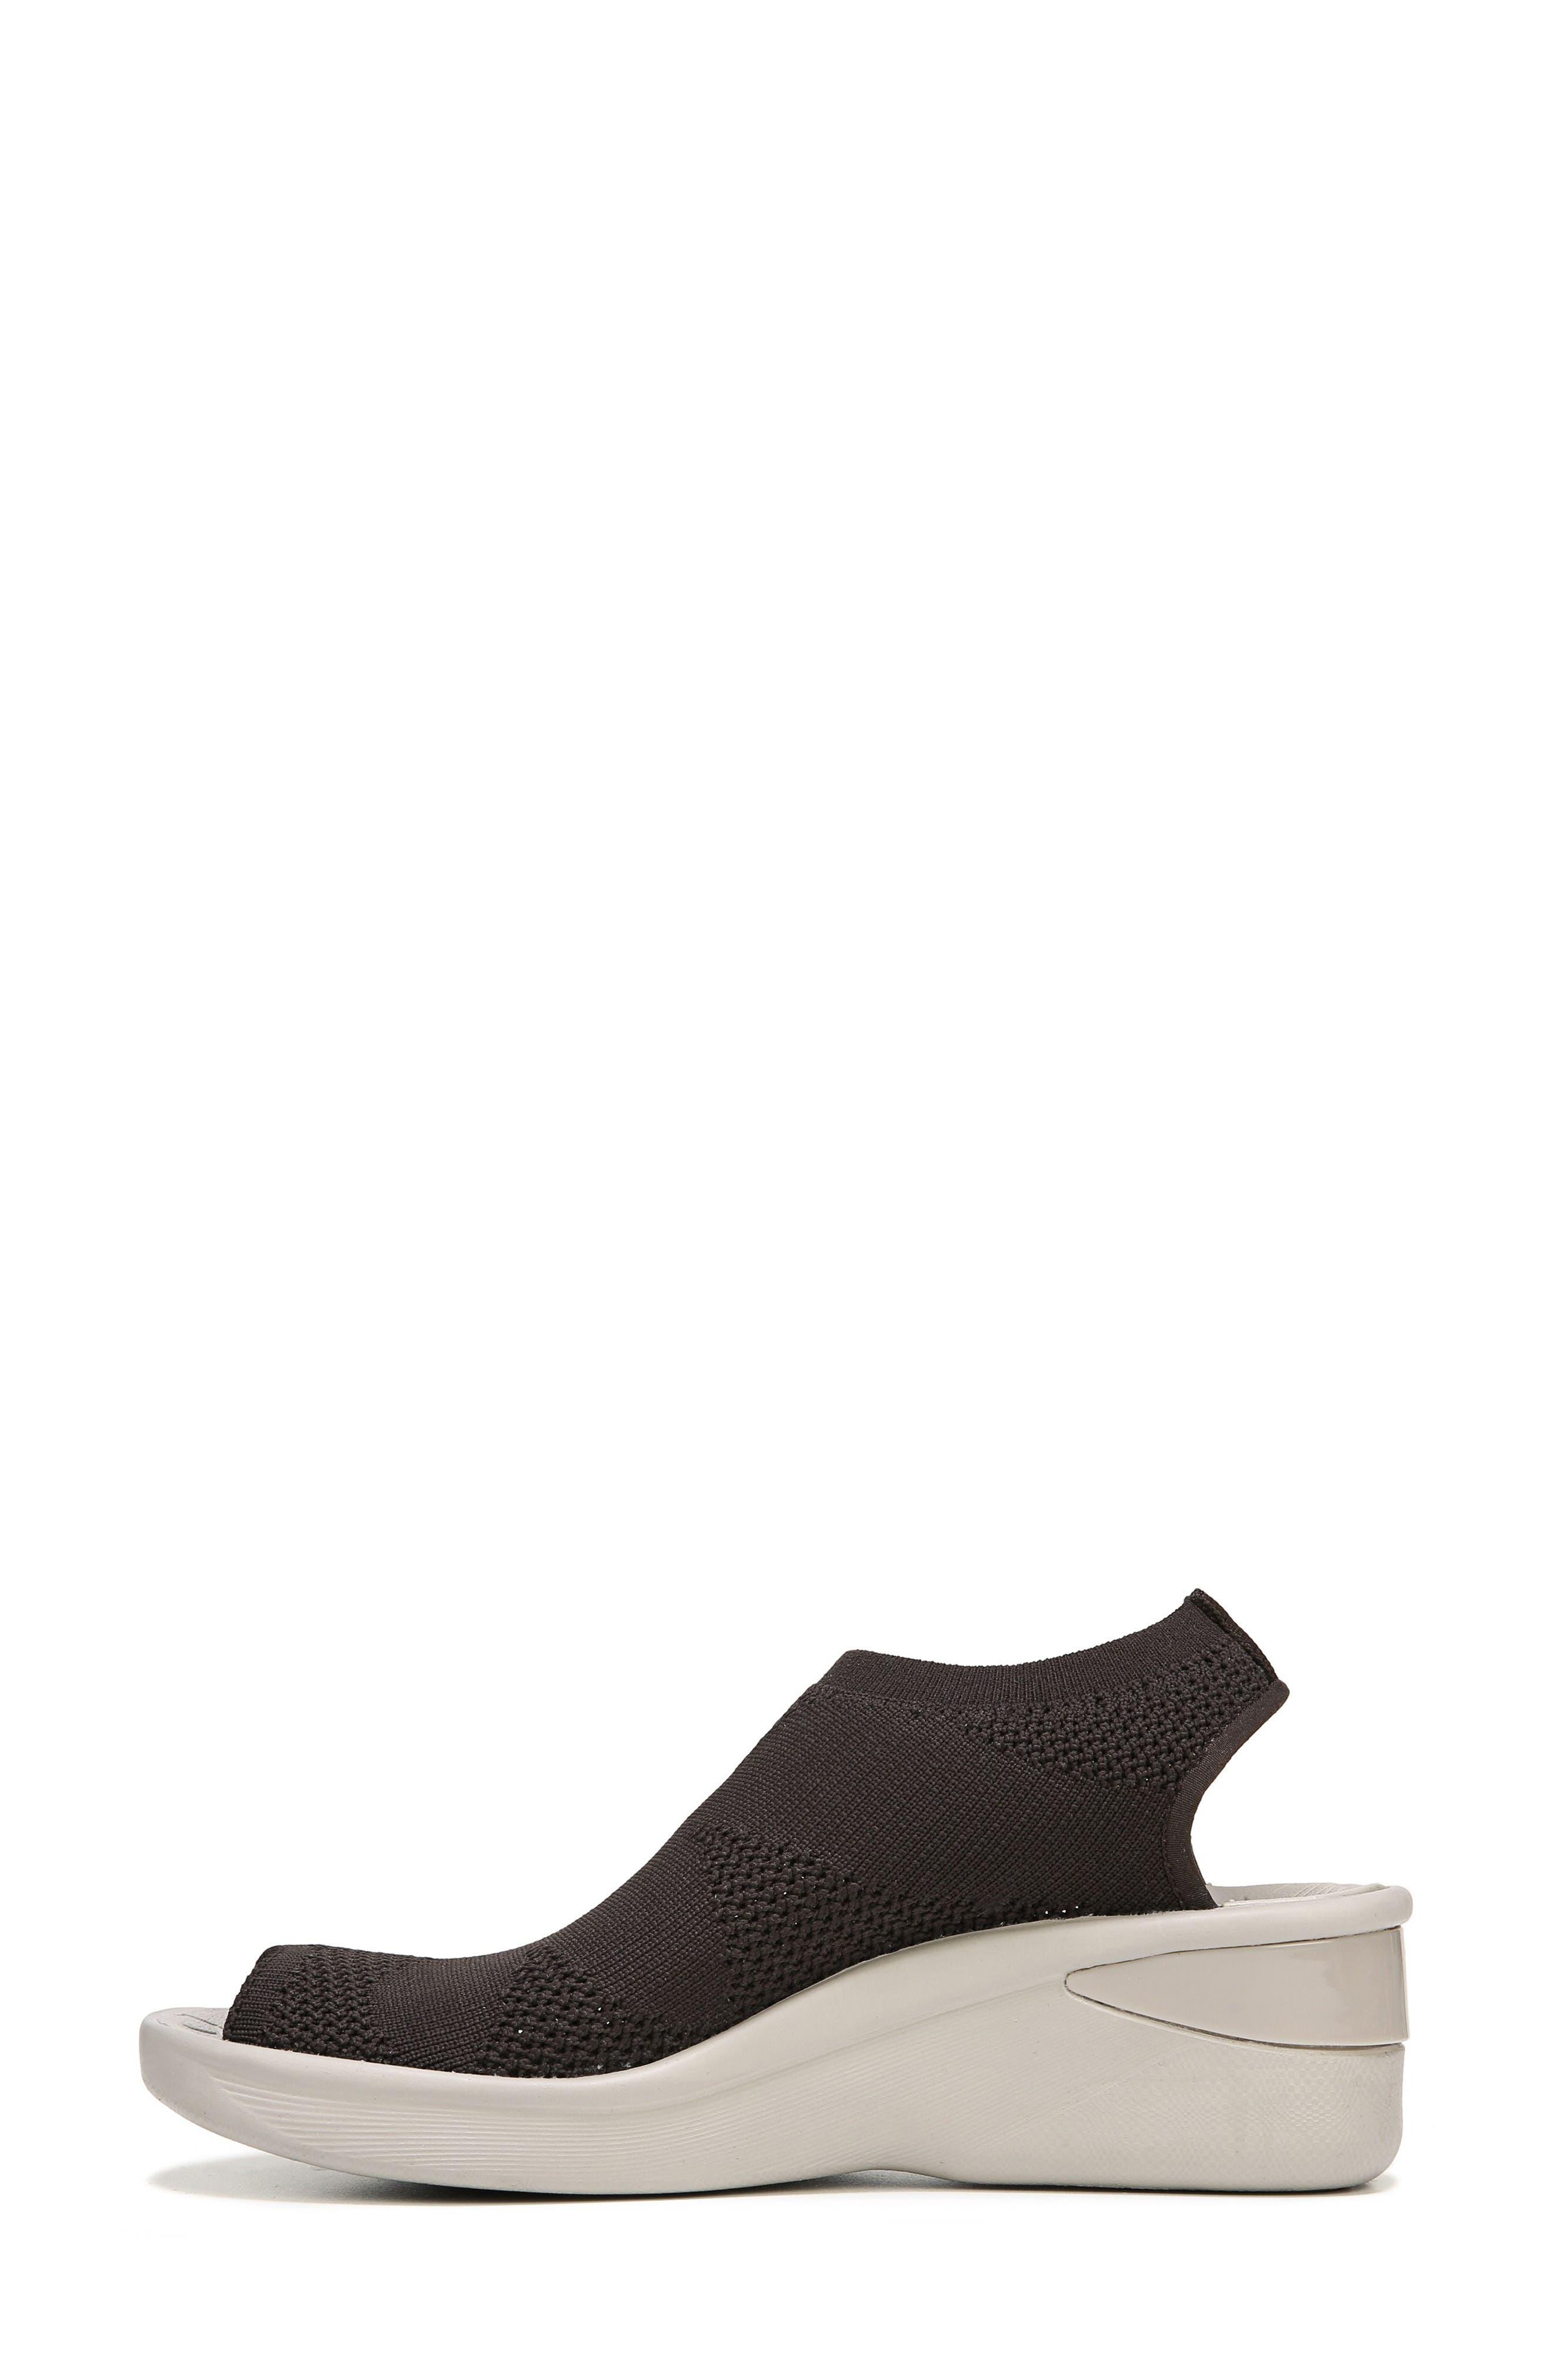 Secret Peep Toe Knit Sneaker,                             Alternate thumbnail 7, color,                             BROWN FABRIC